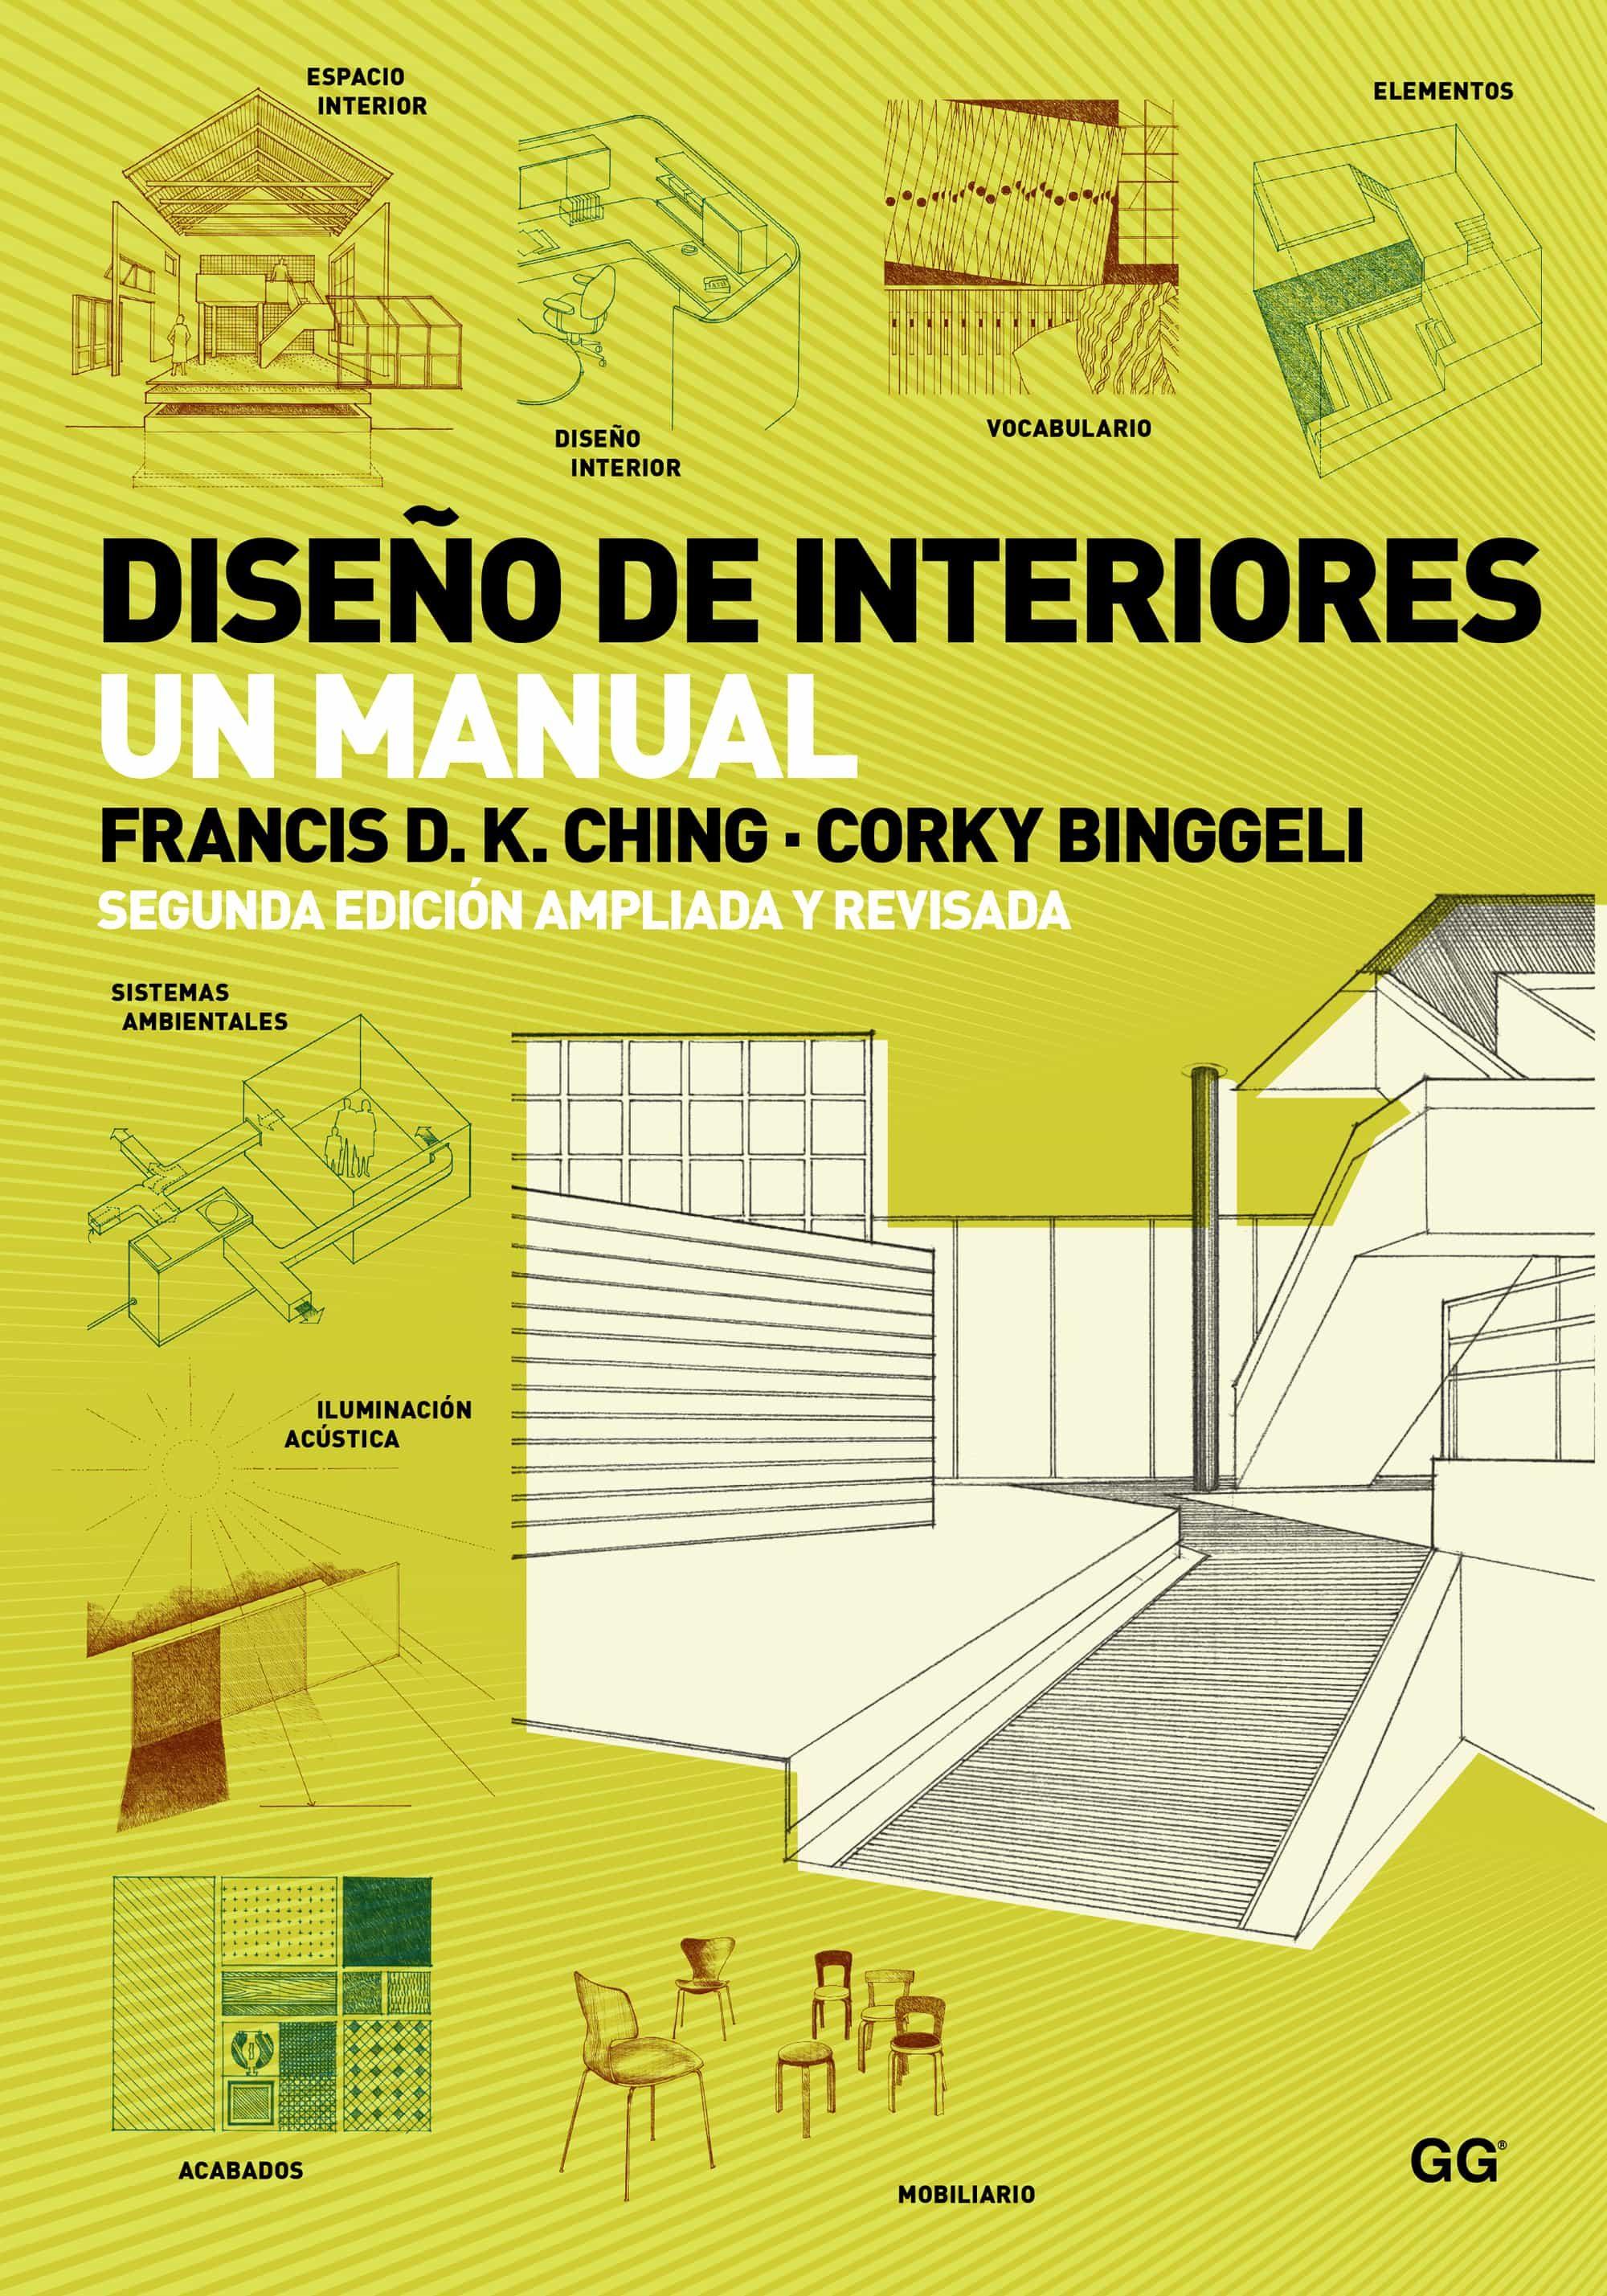 Diseño De Interiores   por Francis D.k. Ching, Corky Binggeli